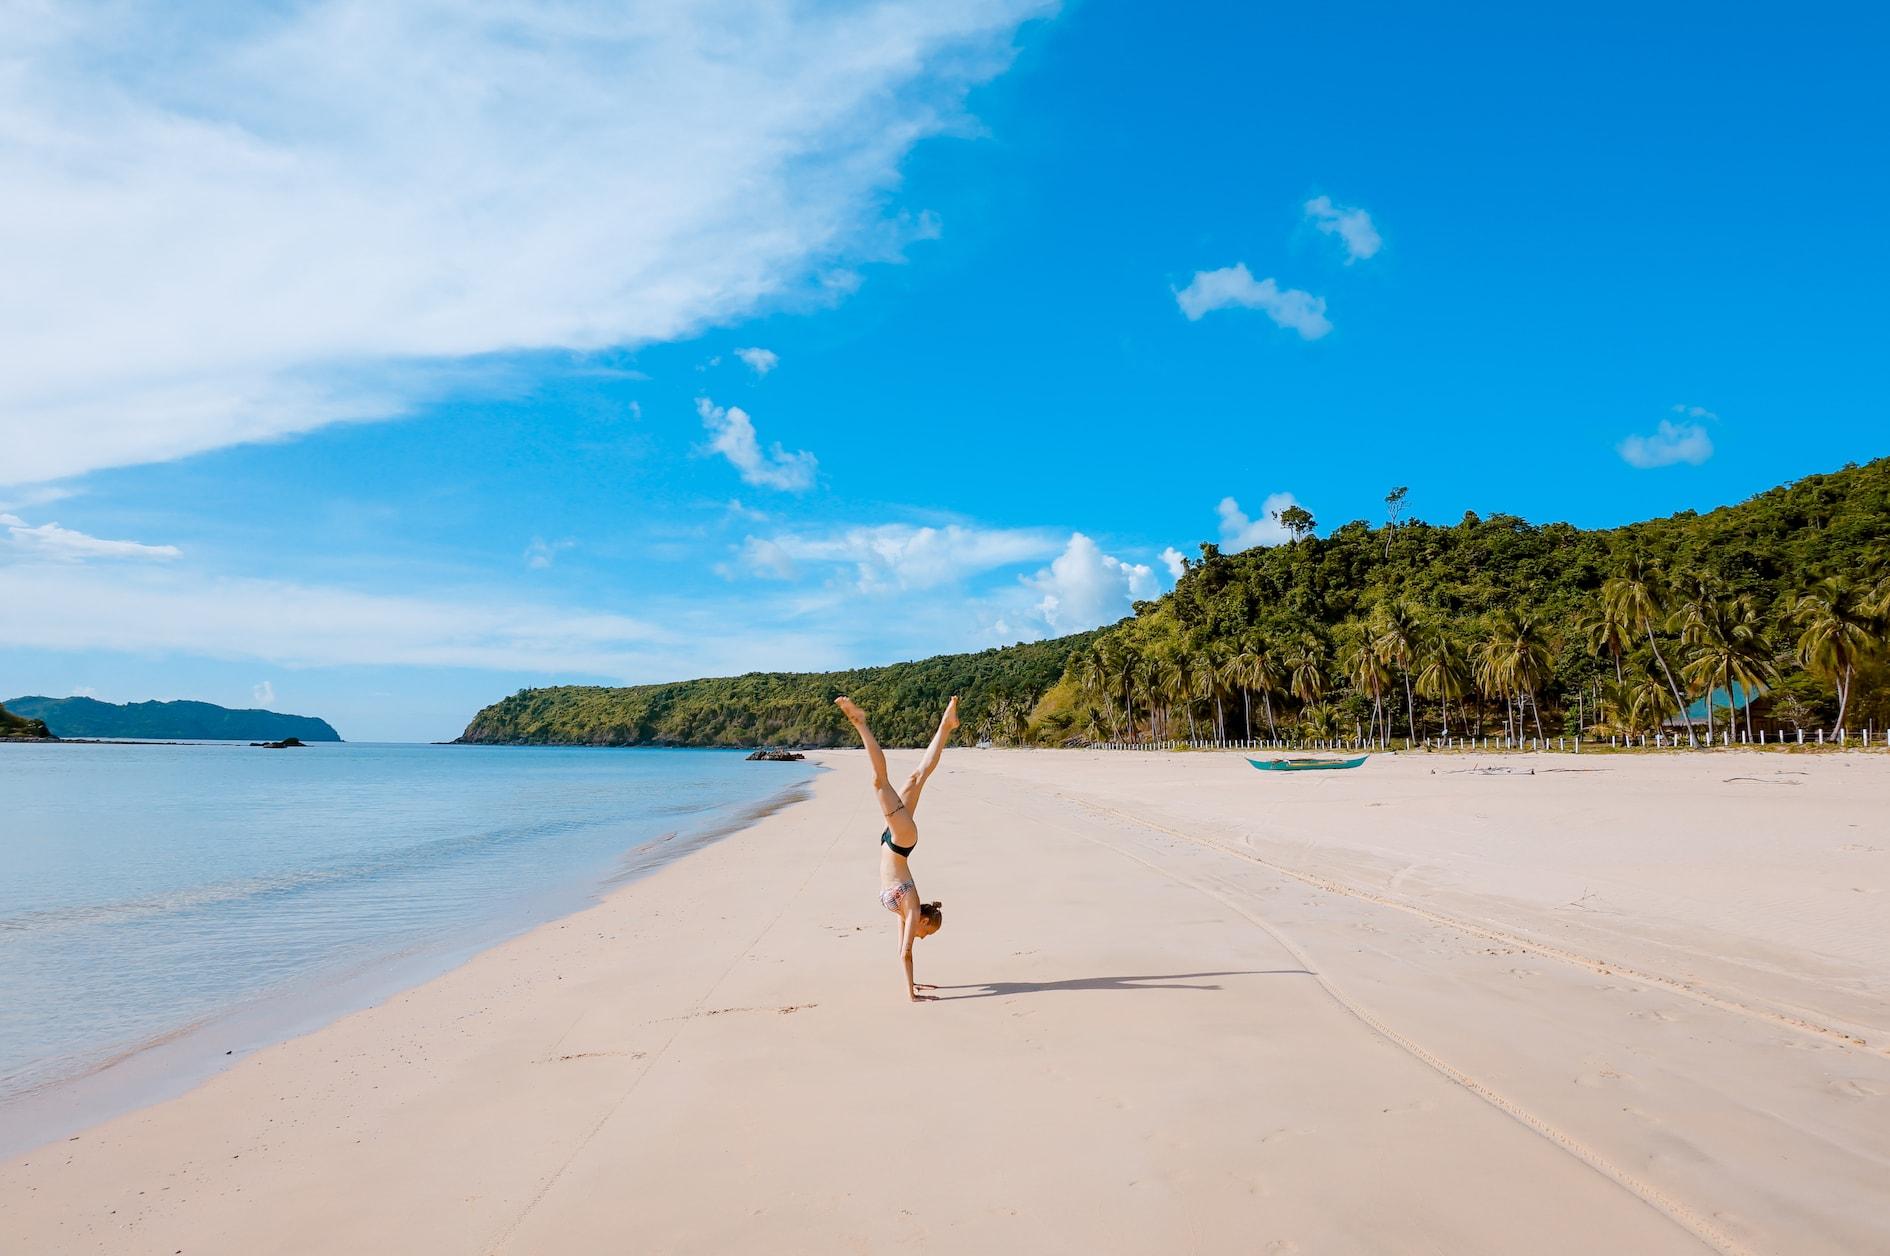 Palawan,_Philippines_(Unsplash)